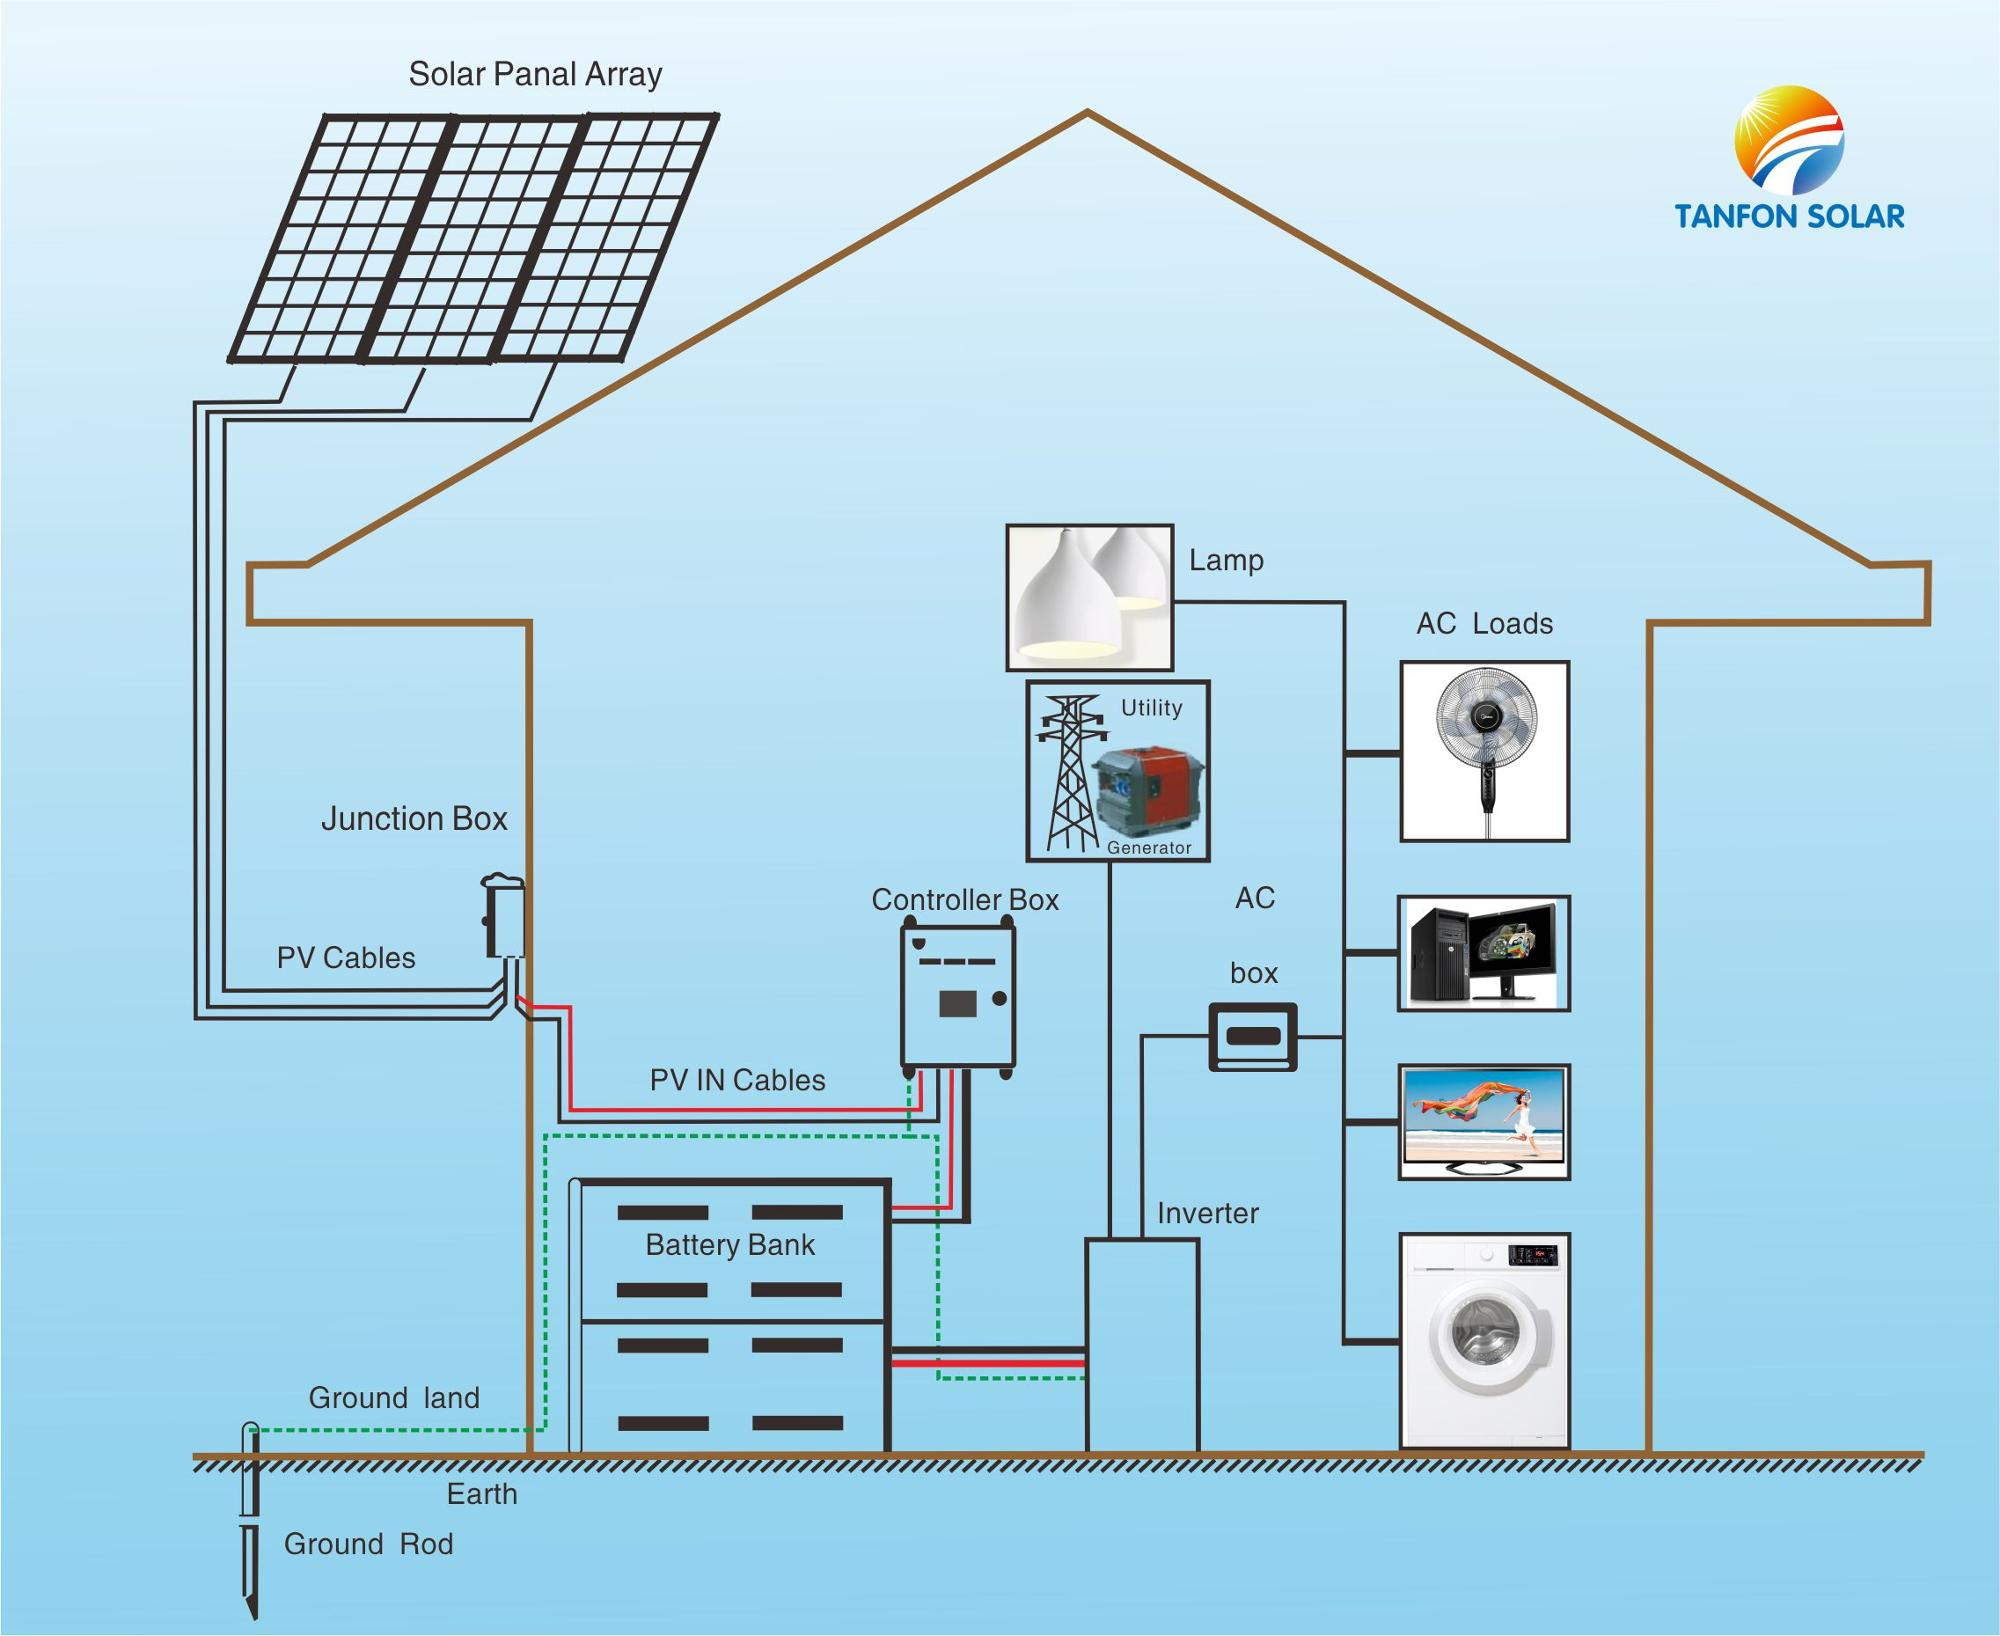 solar generator 3kw 3000w 3000 watts solar panels for home Off-Grid Solar Panel Wiring